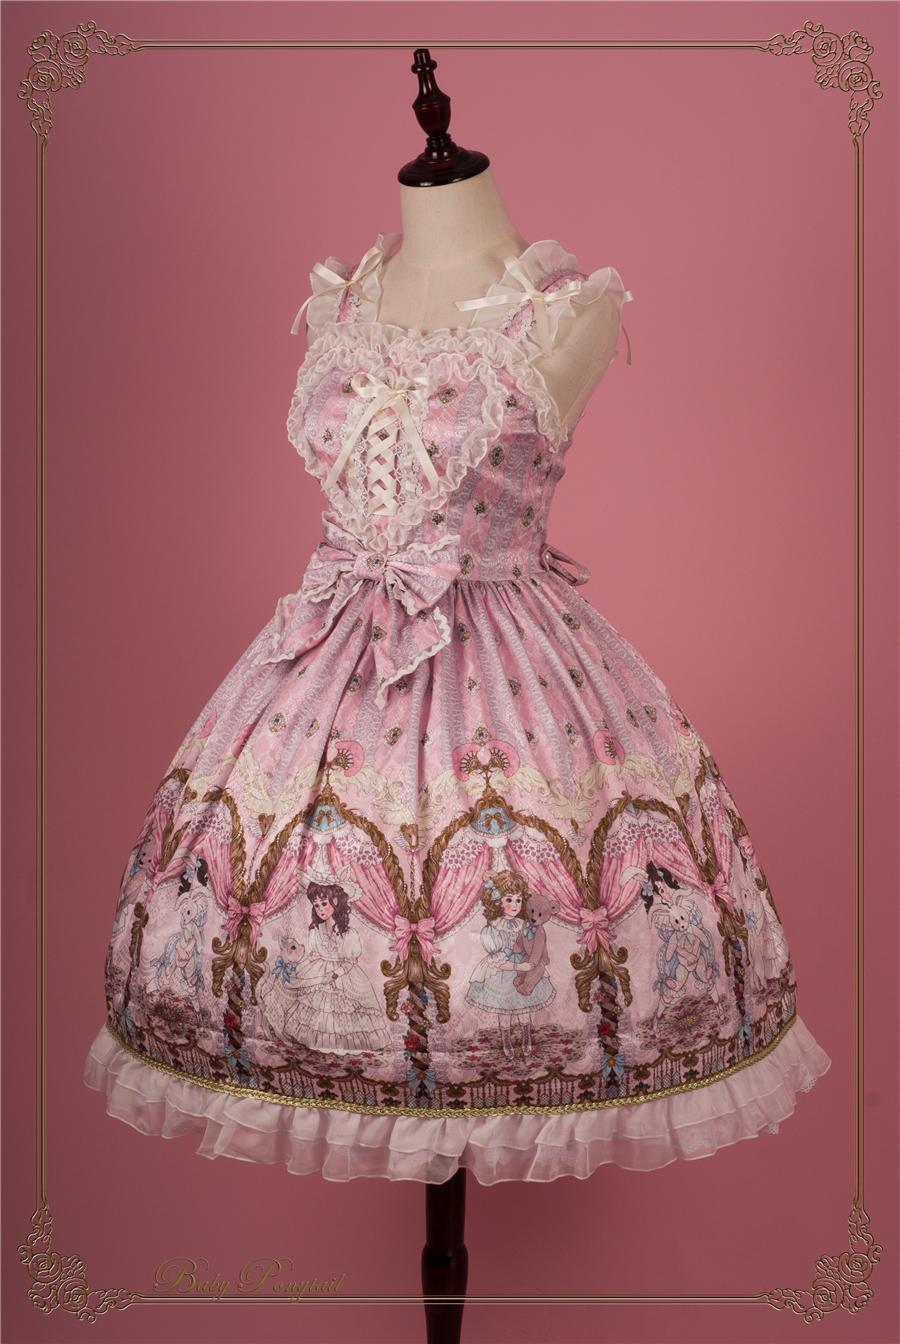 BabyPonytail_Stock Photo_My Favorite Companion_JSK Pink_4.jpg